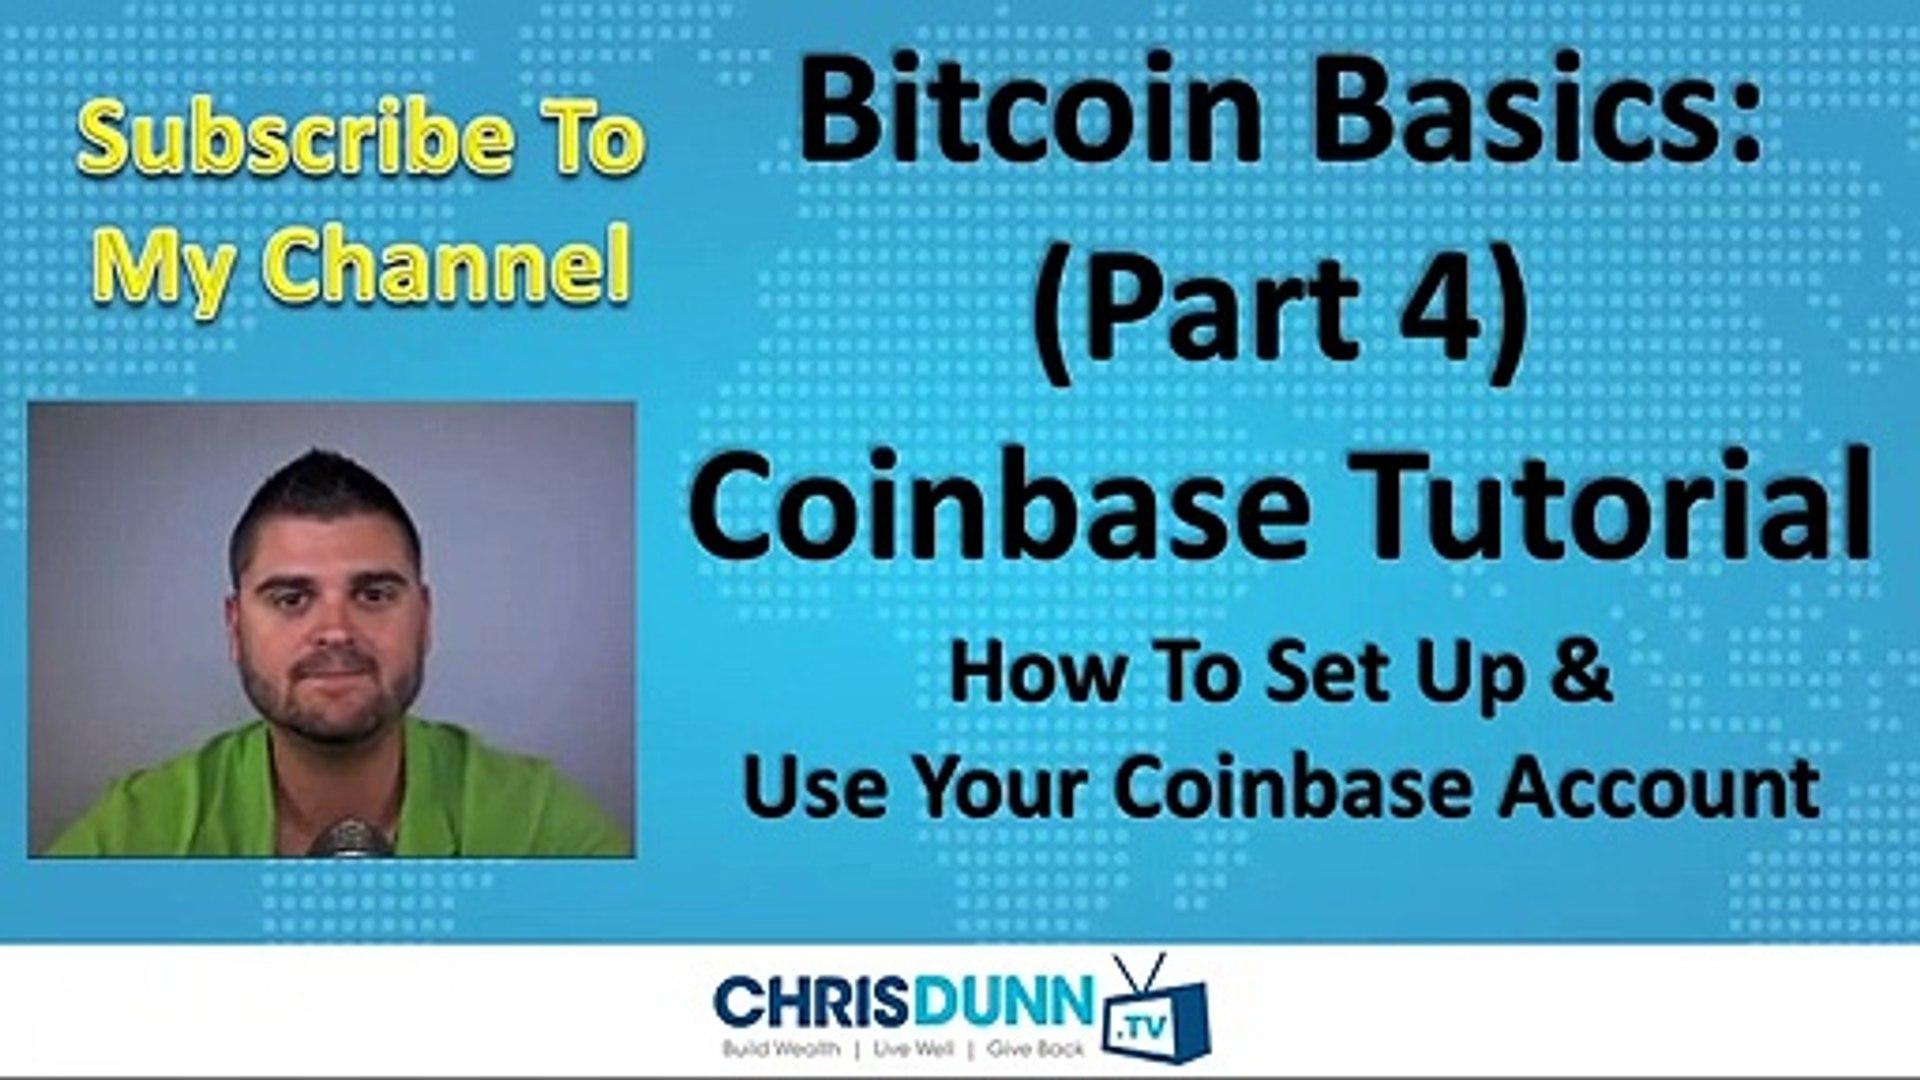 Bitcoin Basics (Part 4) - _Coinbase Tutorial_